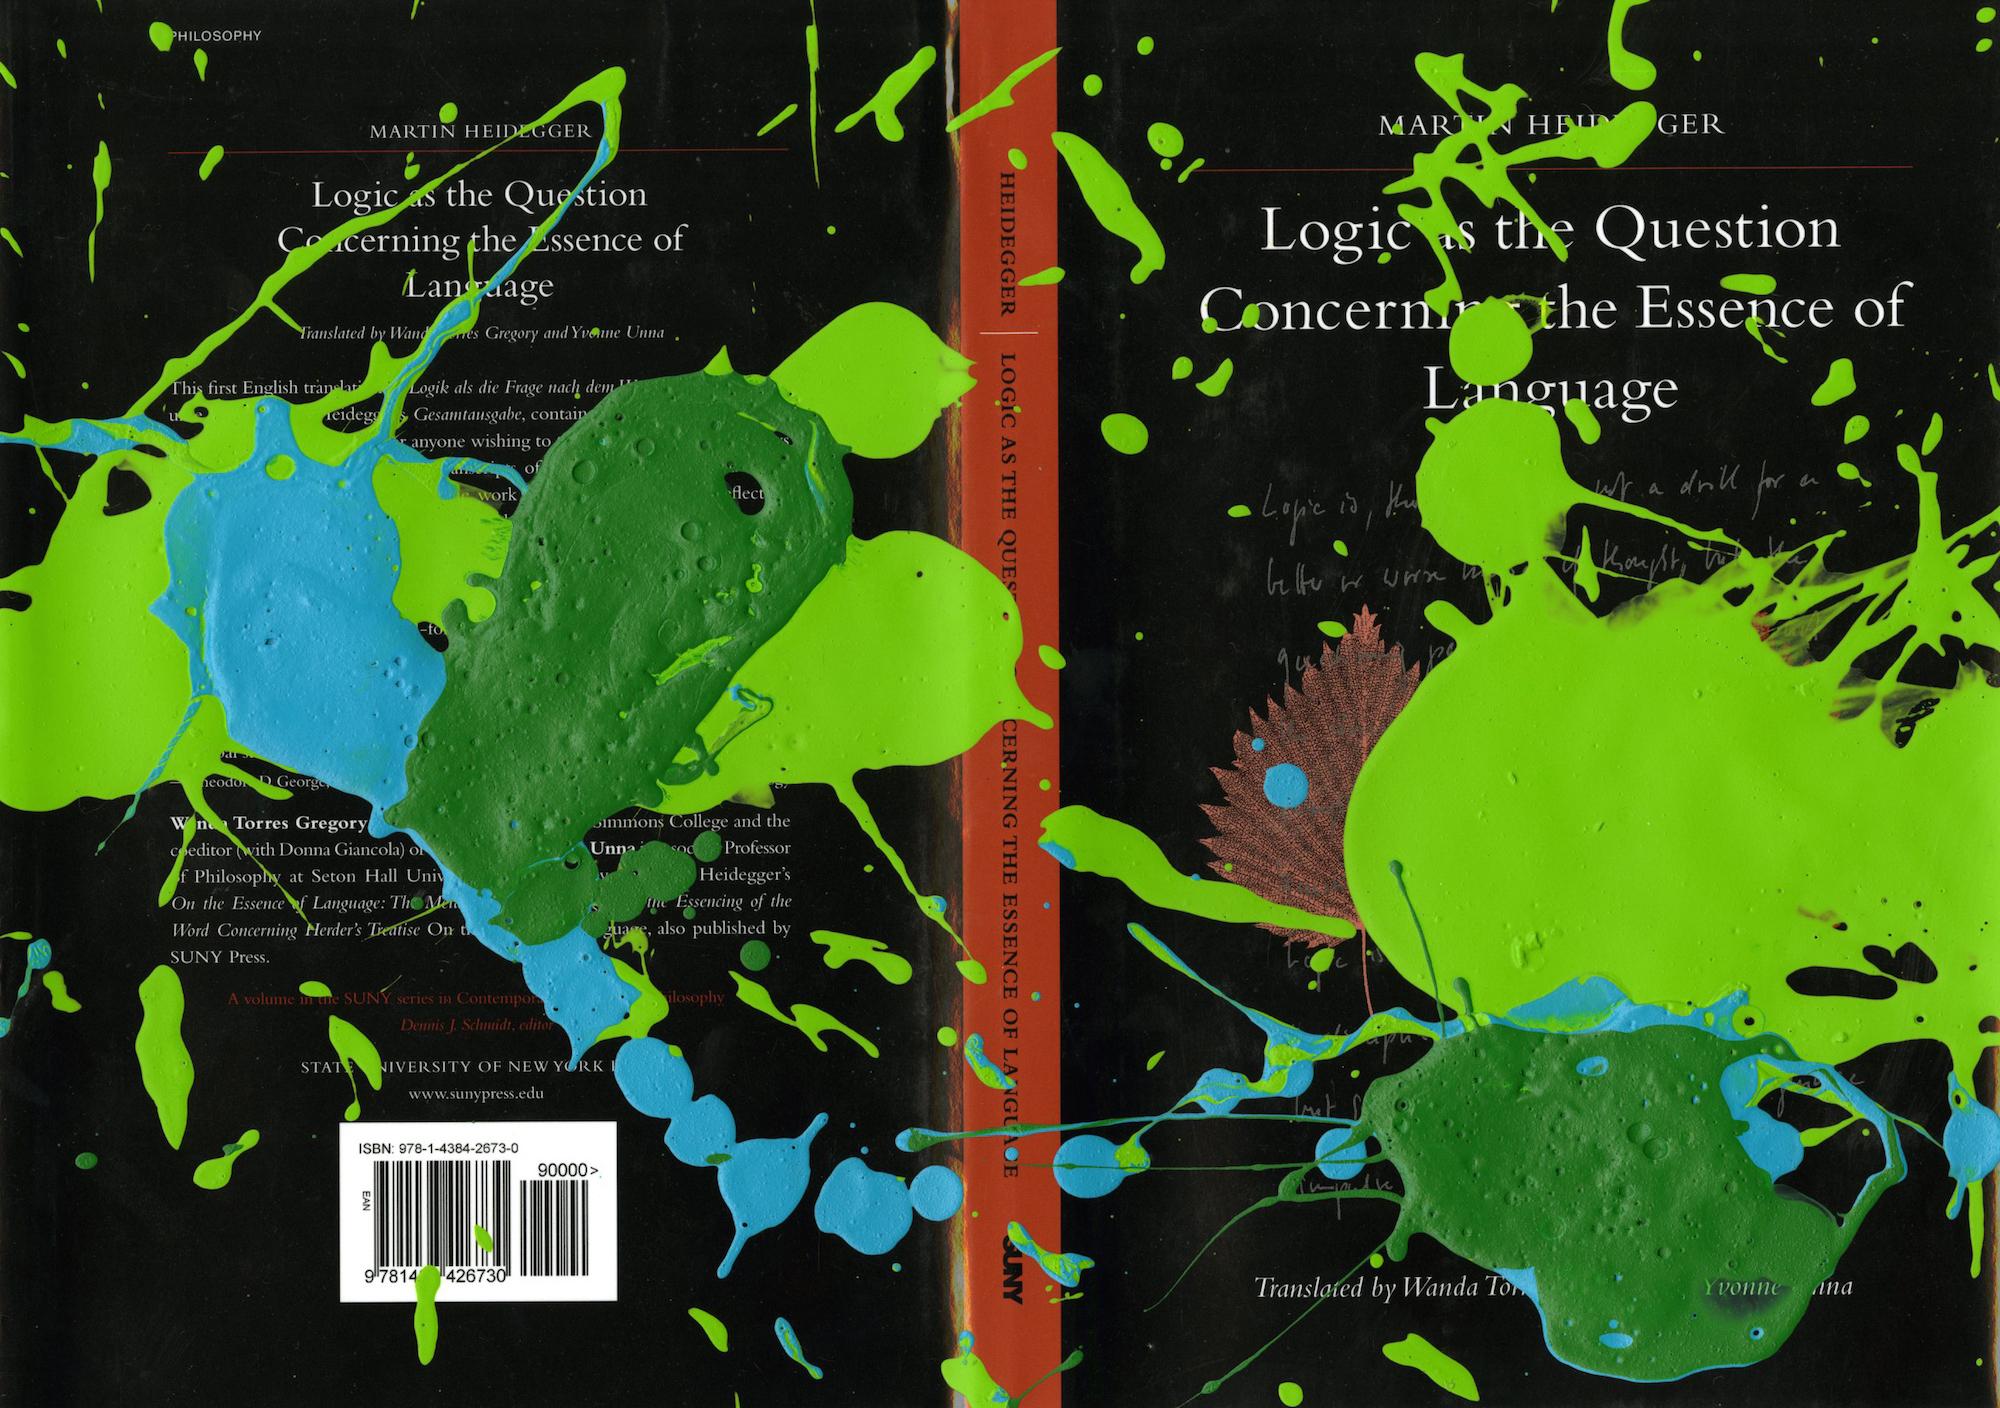 Mark Titmarsh, Phenomenological Interpretations, 2010, acrylic on paper (dust jacket), 21 x 30cm (Dust Jacket for an Exhibition Postponed 0)